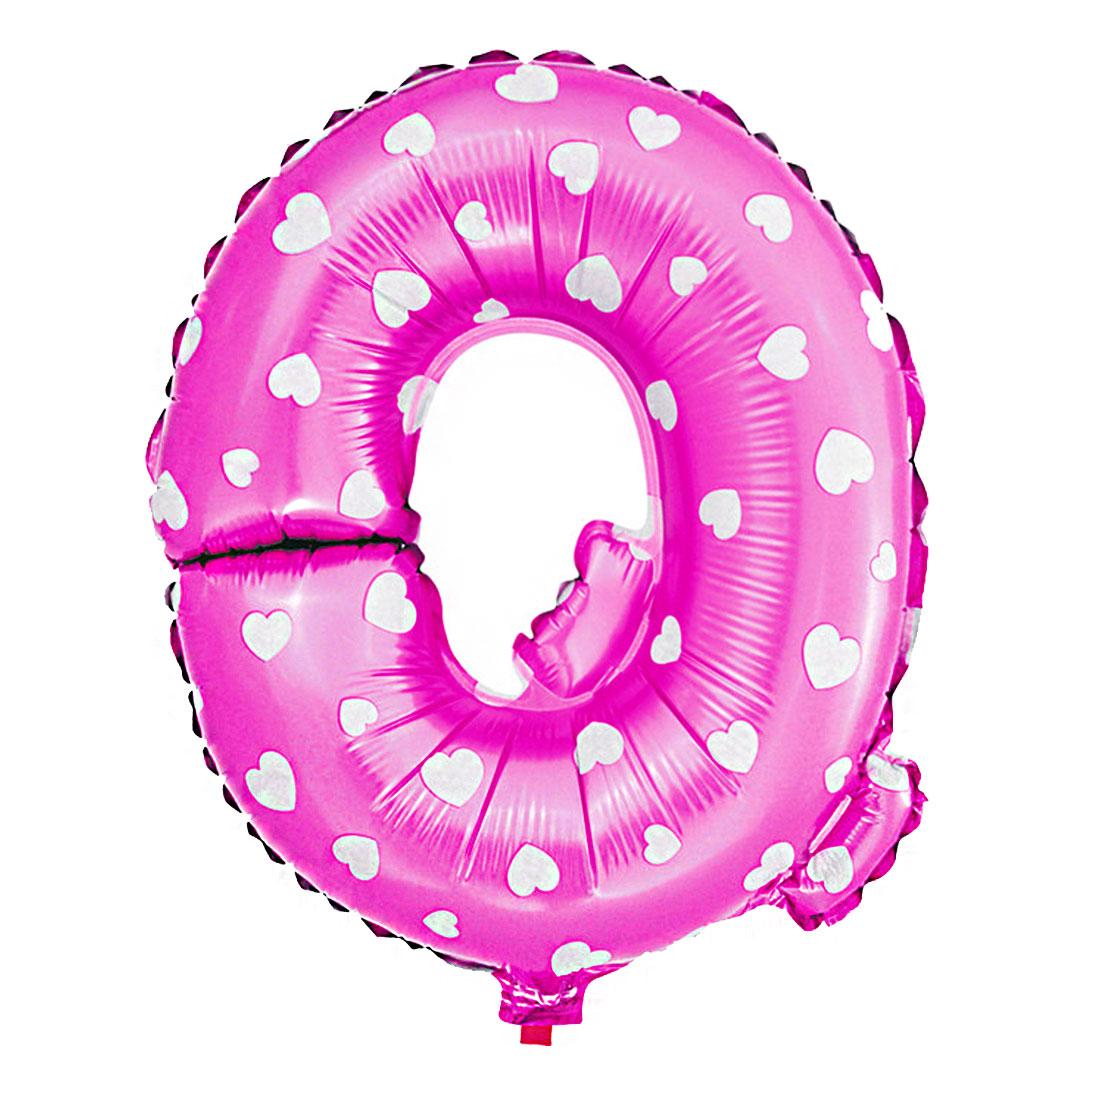 Foil Letter Q Heart Pattern Helium Balloon Birthday Wedding Decor Fuchsia 16